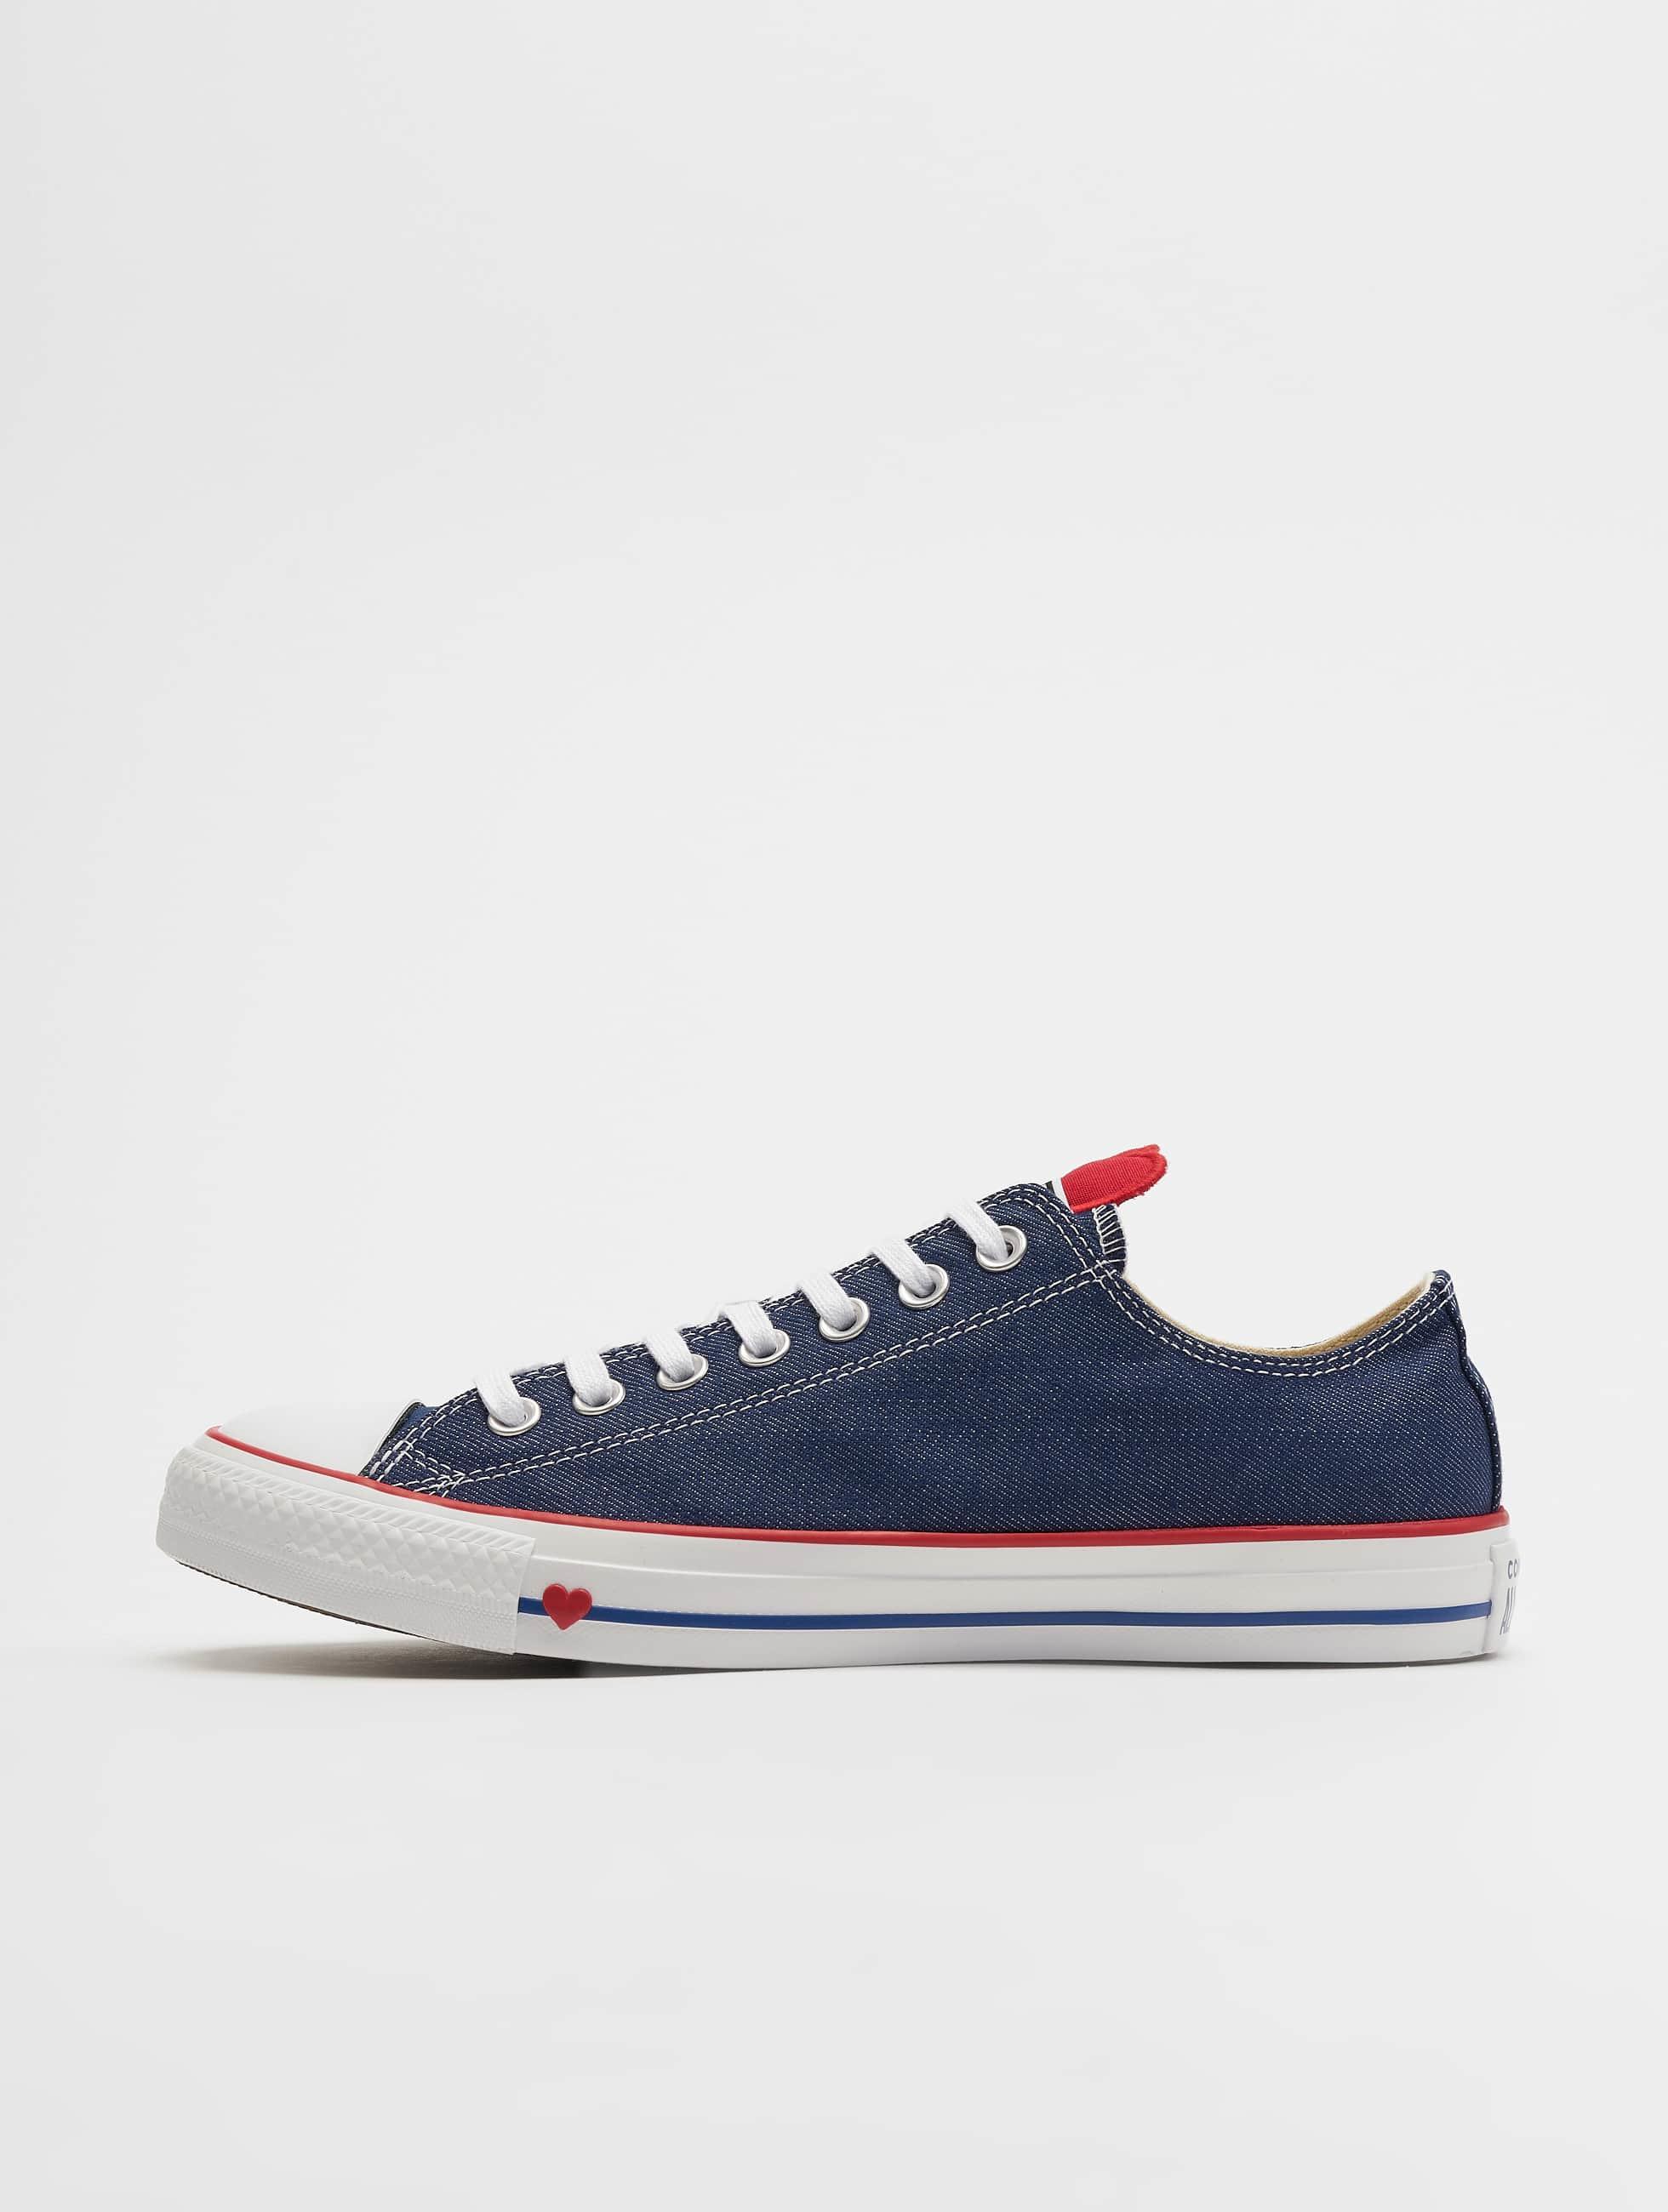 Converse Chuck Taylor All Star Ox Sneakers IndigoEnamel RedWhite